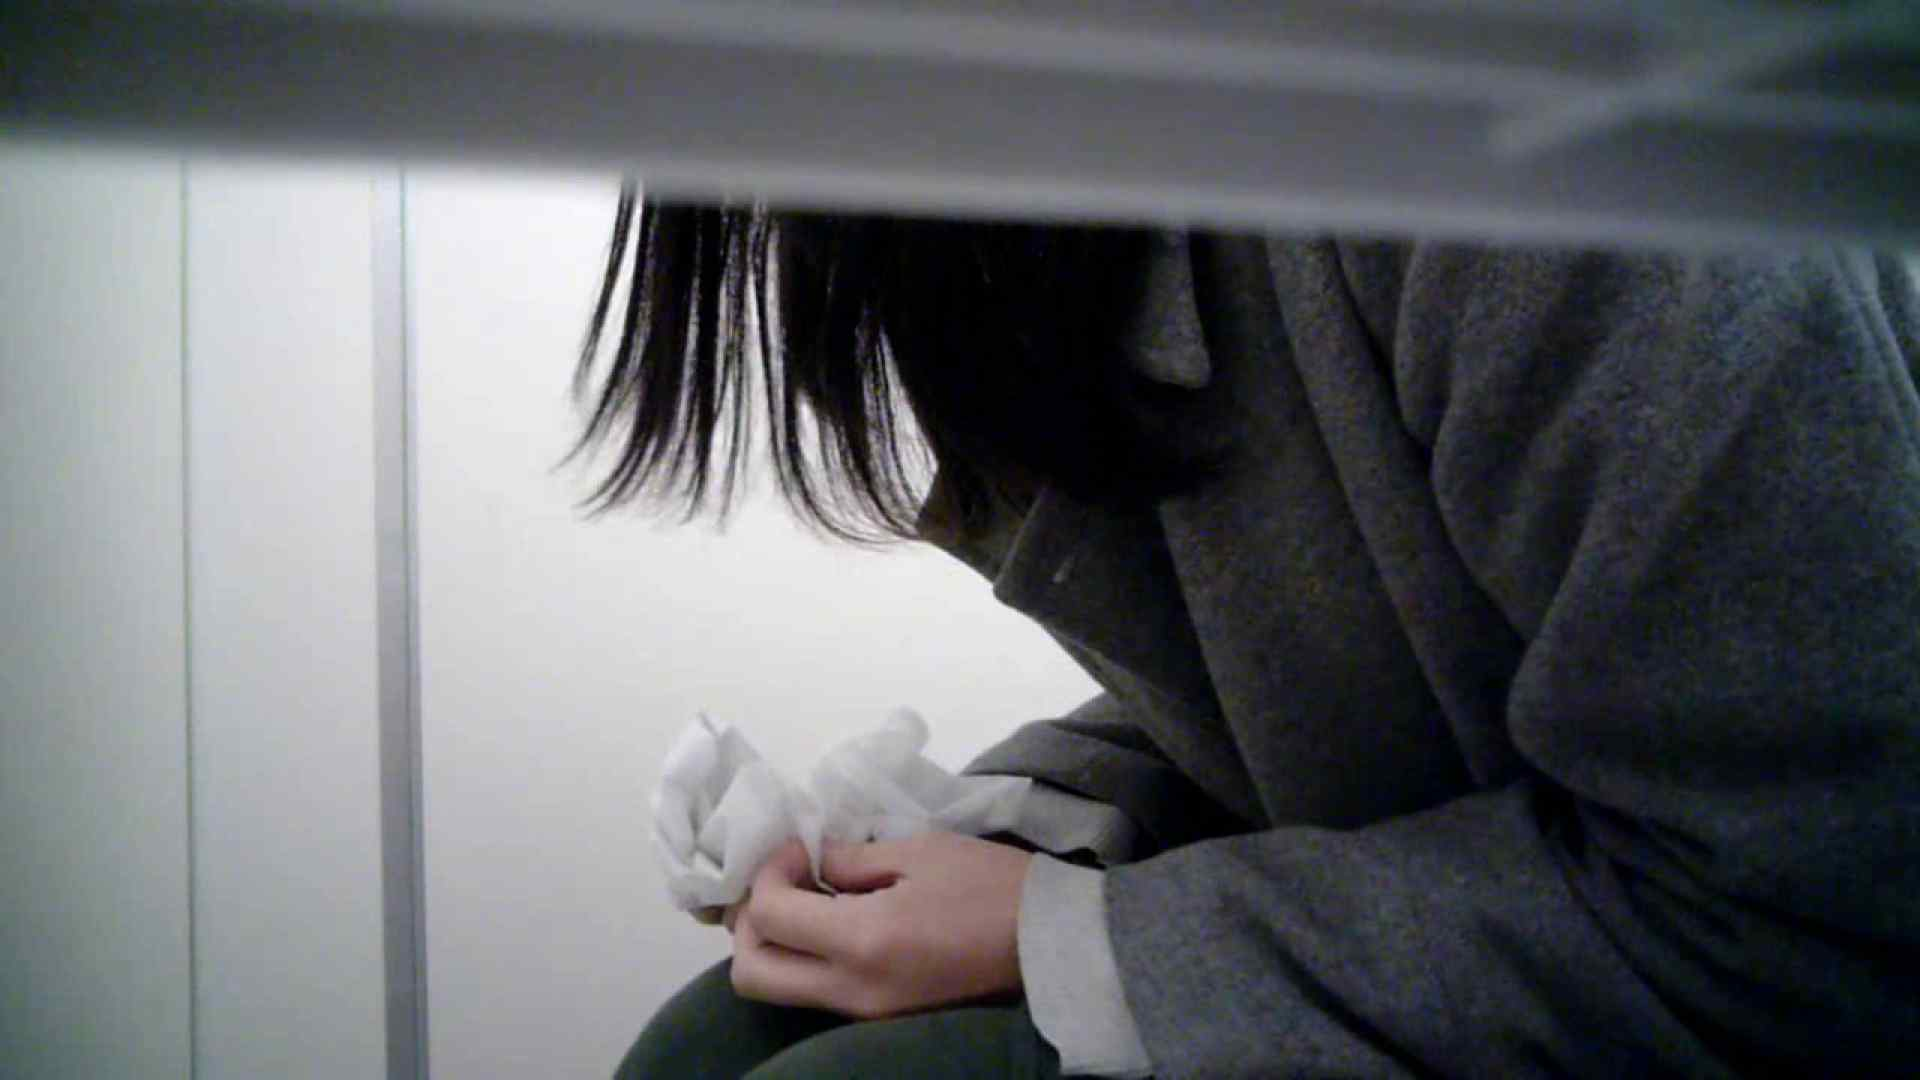 vol.28 最近では、黒いナプキンも売っているので…ファッ! 洗面所 隠し撮りAV無料 45pic 16